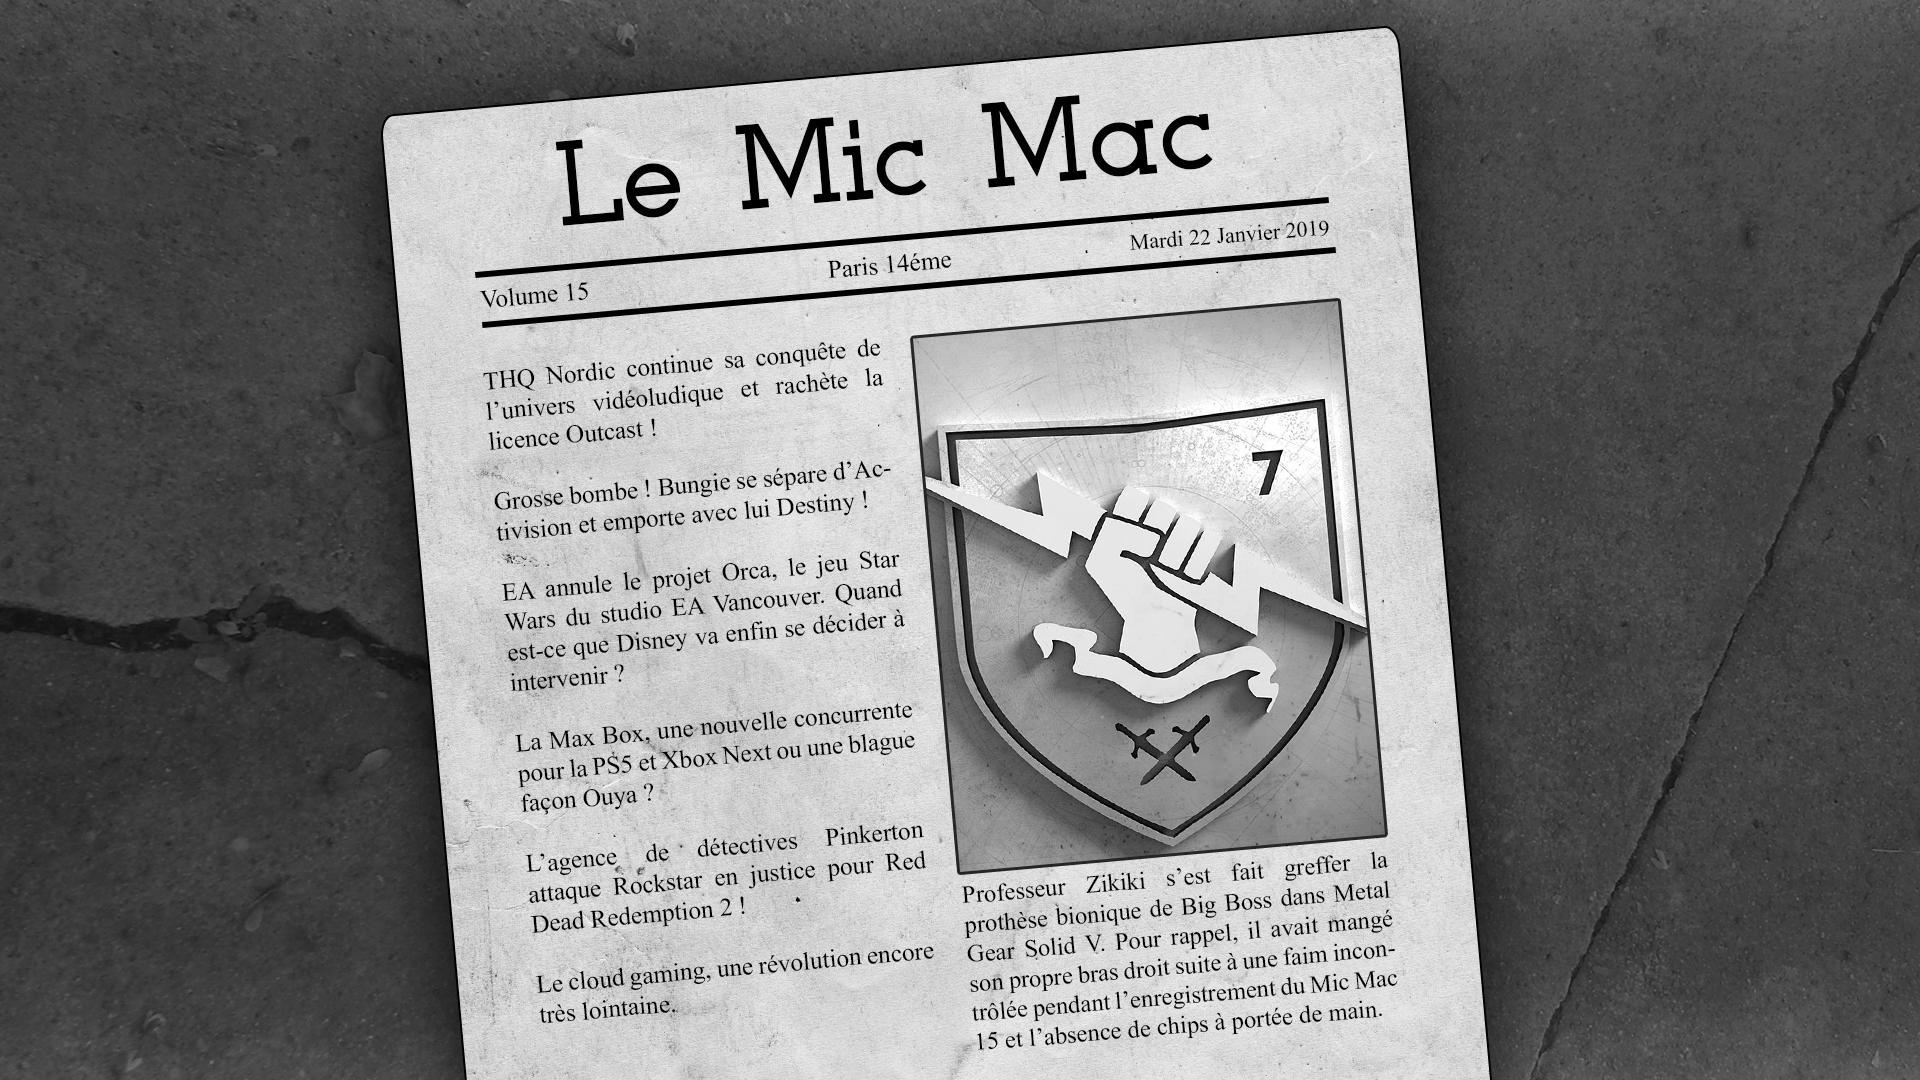 Au Tour du Mic – Mic Mac #15: 08/01/2019 au 21/01/2019